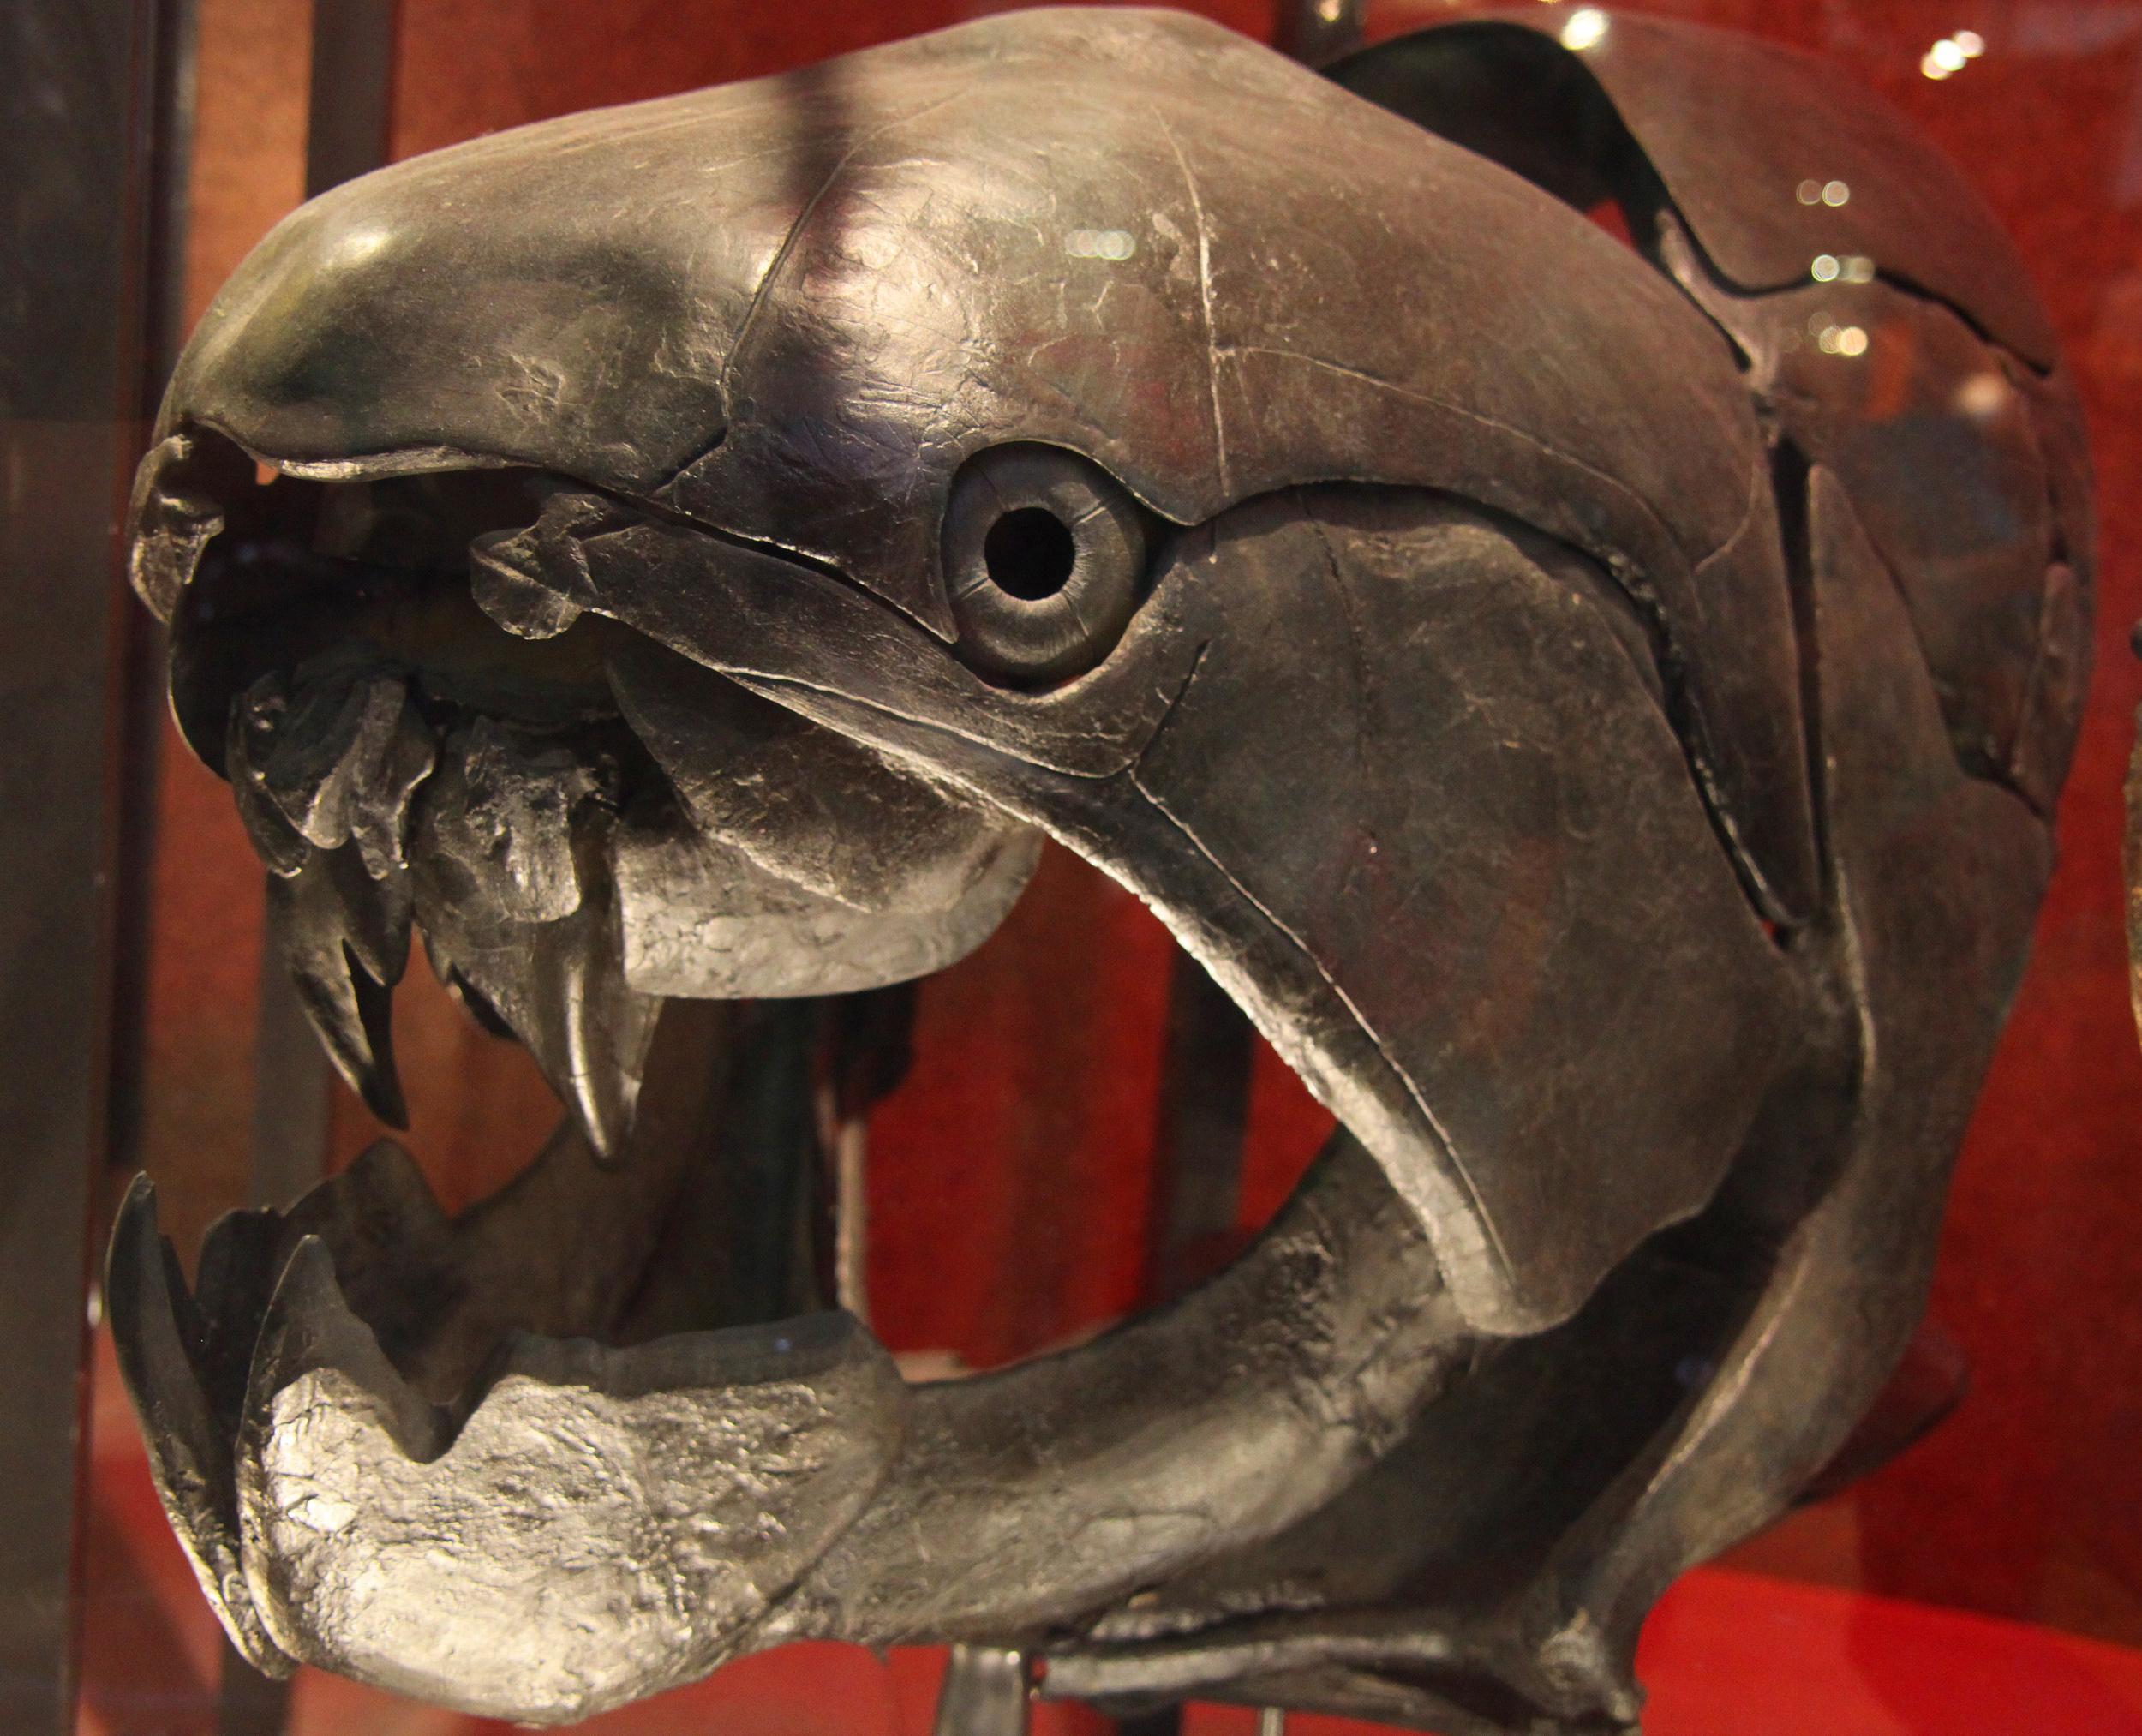 humans should thank ancient scottish fish fossils